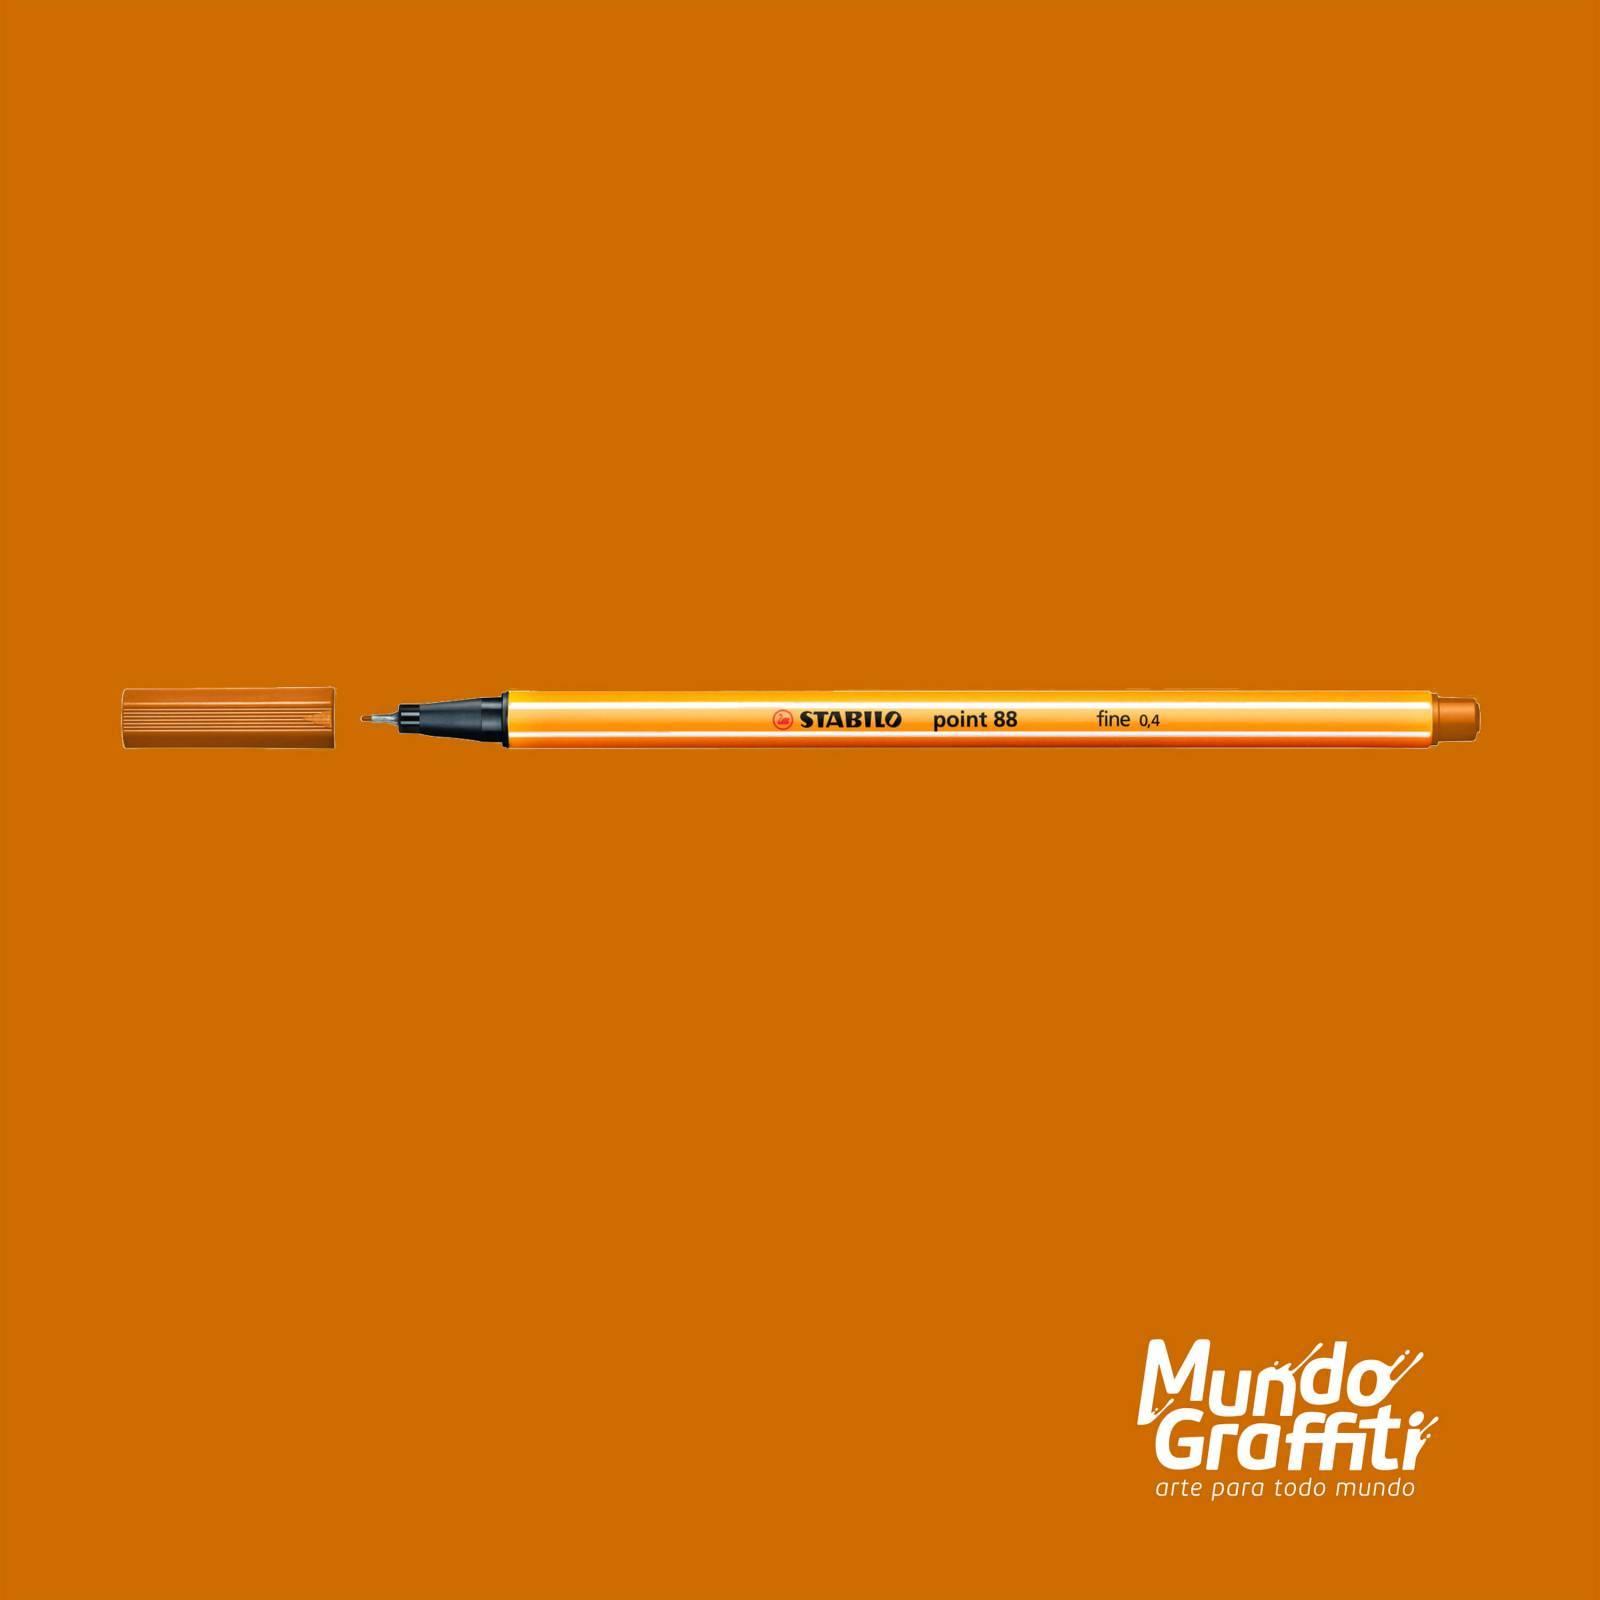 Caneta Stabilo Point 88/89 Marrom Claro 0,4mm - Mundo Graffiti